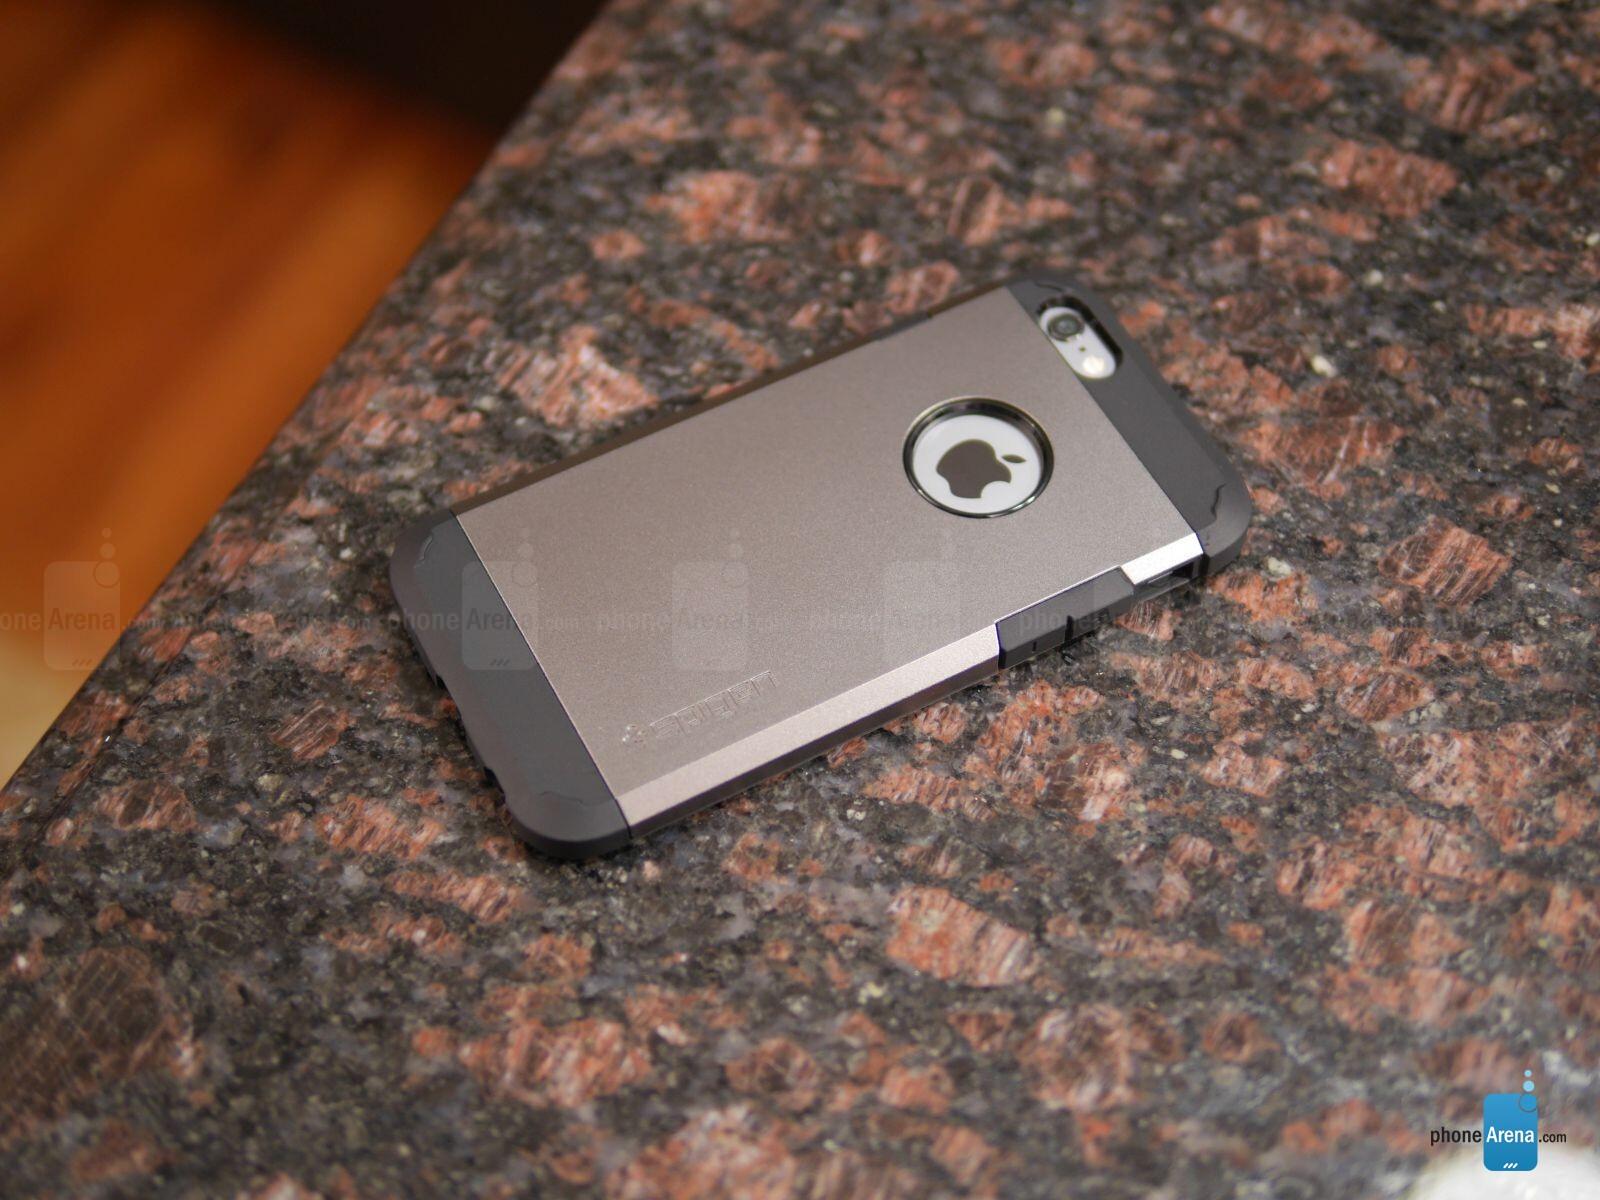 spigen tough armor case for apple iphone 6 review. Black Bedroom Furniture Sets. Home Design Ideas